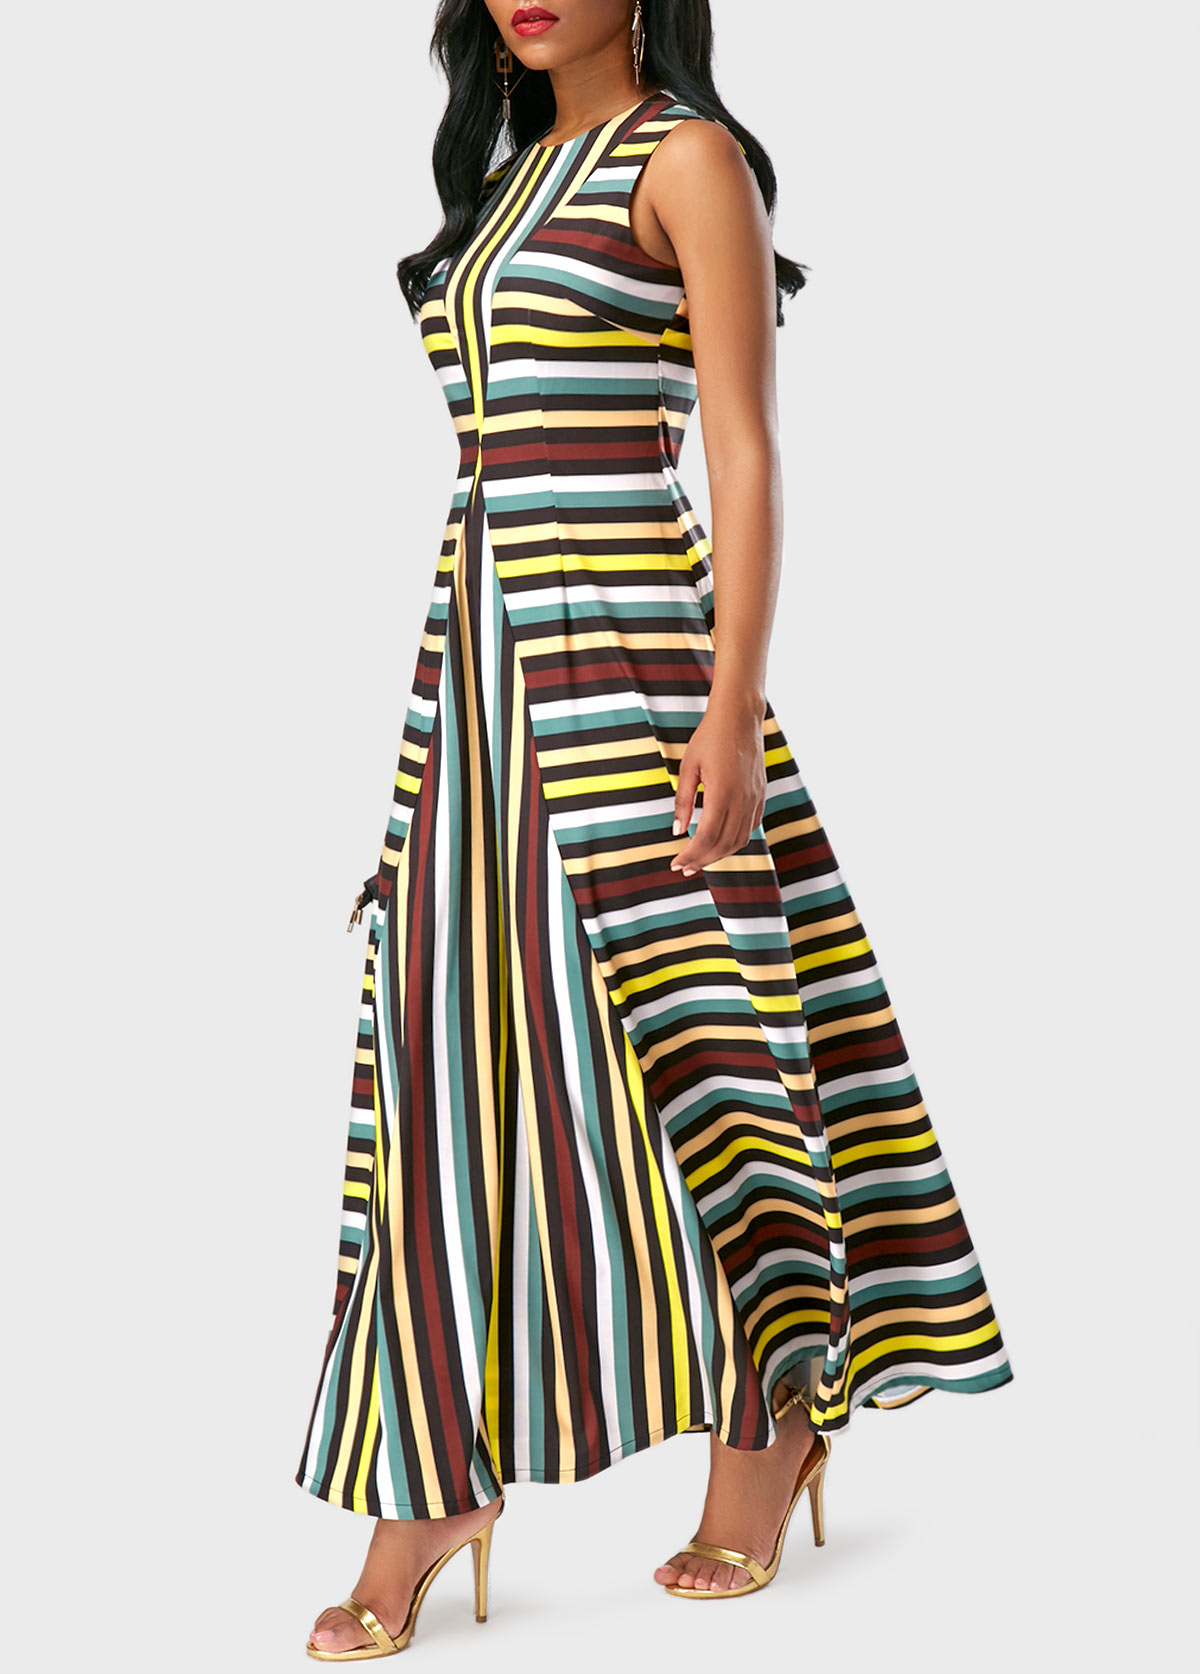 Spaghetti Strap Asymmetric Hem Cascading Ruffles Floral Printed Sleeveless Maxi Dresses reviews